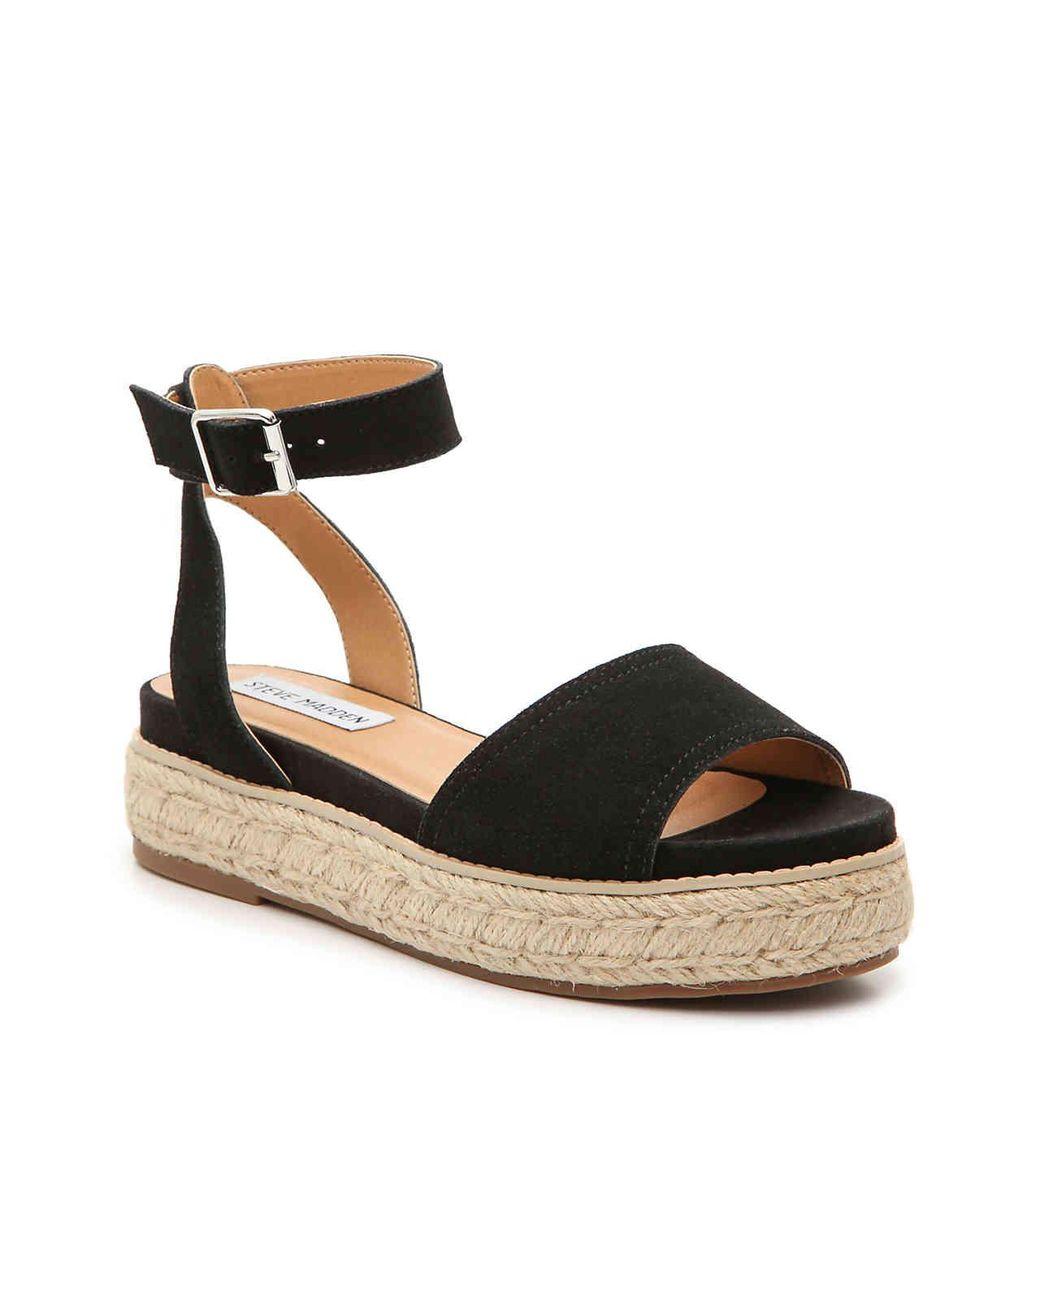 63cf3222b33 Women's Black Gabi Espadrille Platform Sandal